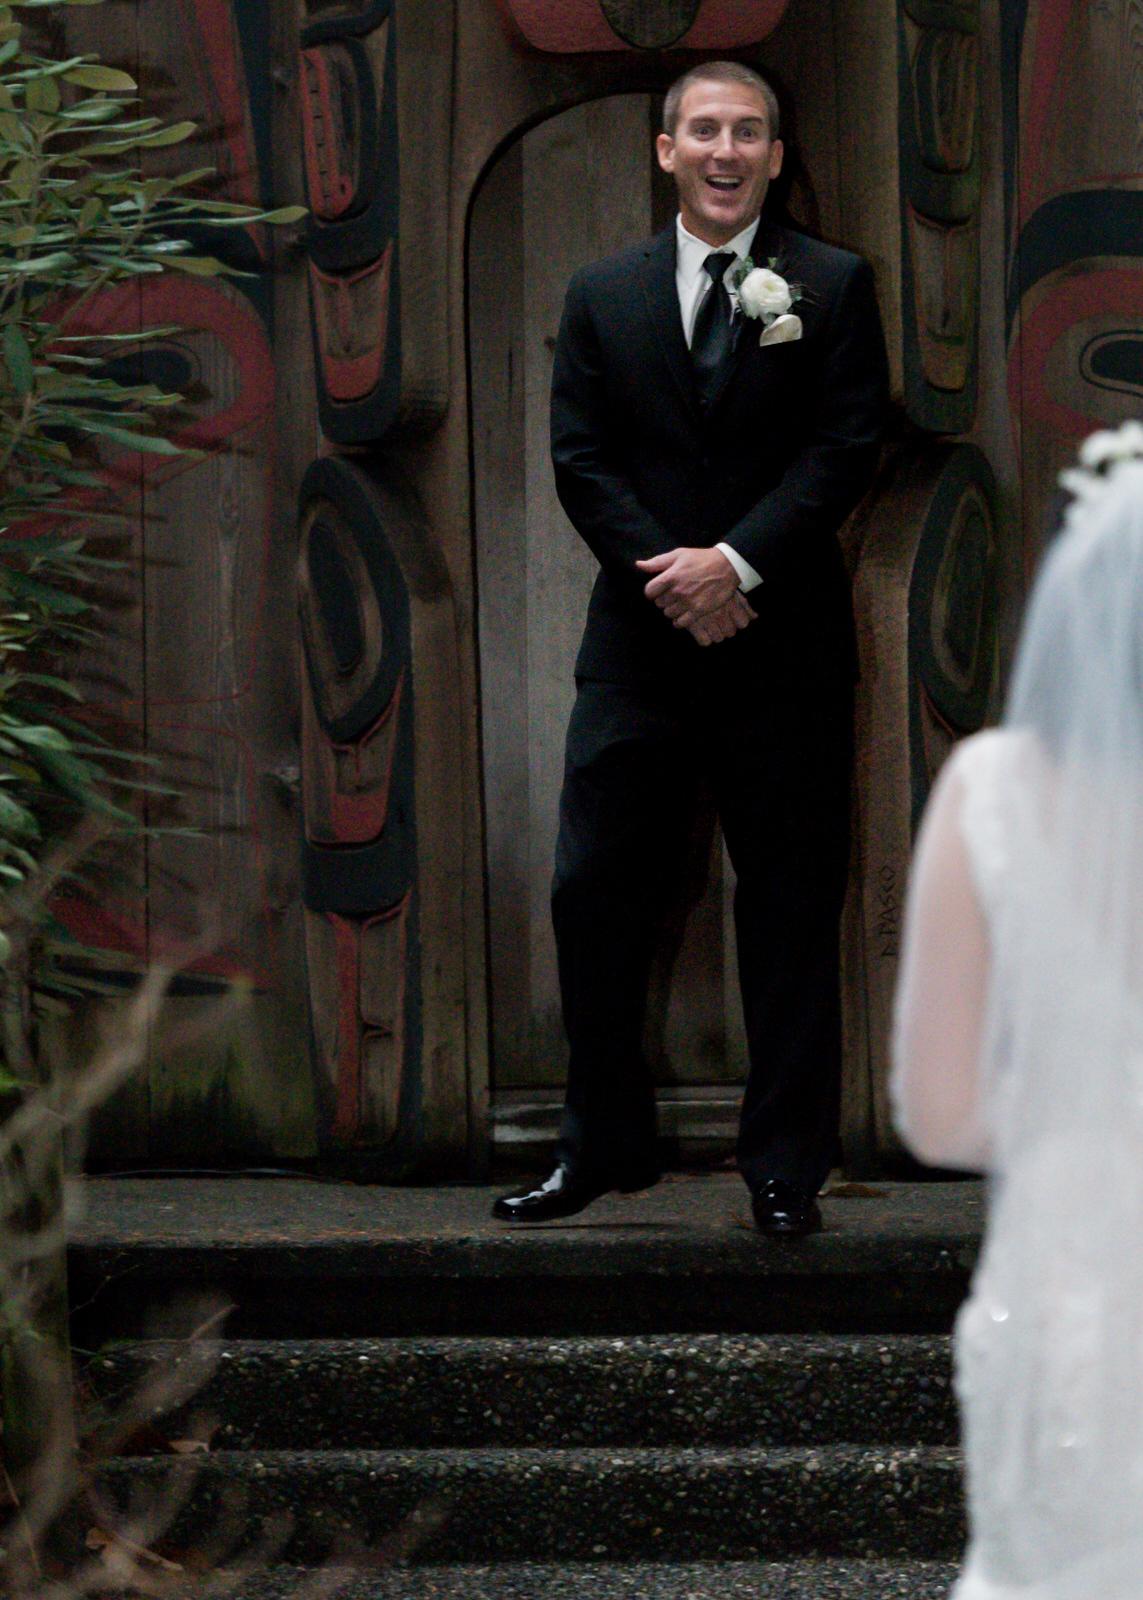 Rustic Winter Wedding Kiana Lodge Poulsbo Rainy Day-18.jpg